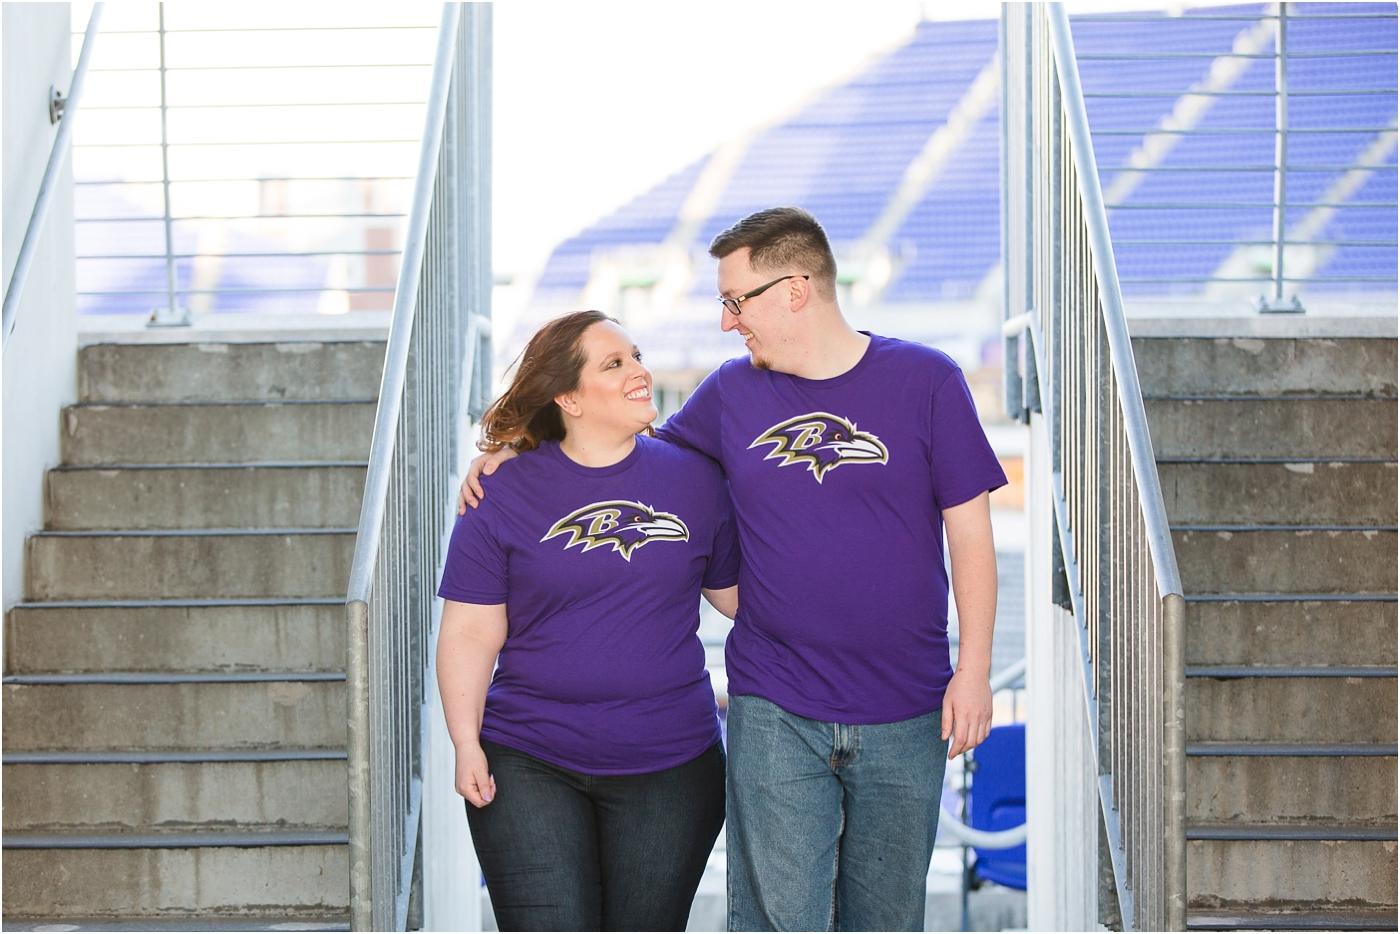 Ravens-Stadium-Engagement-Photos-36.jpg